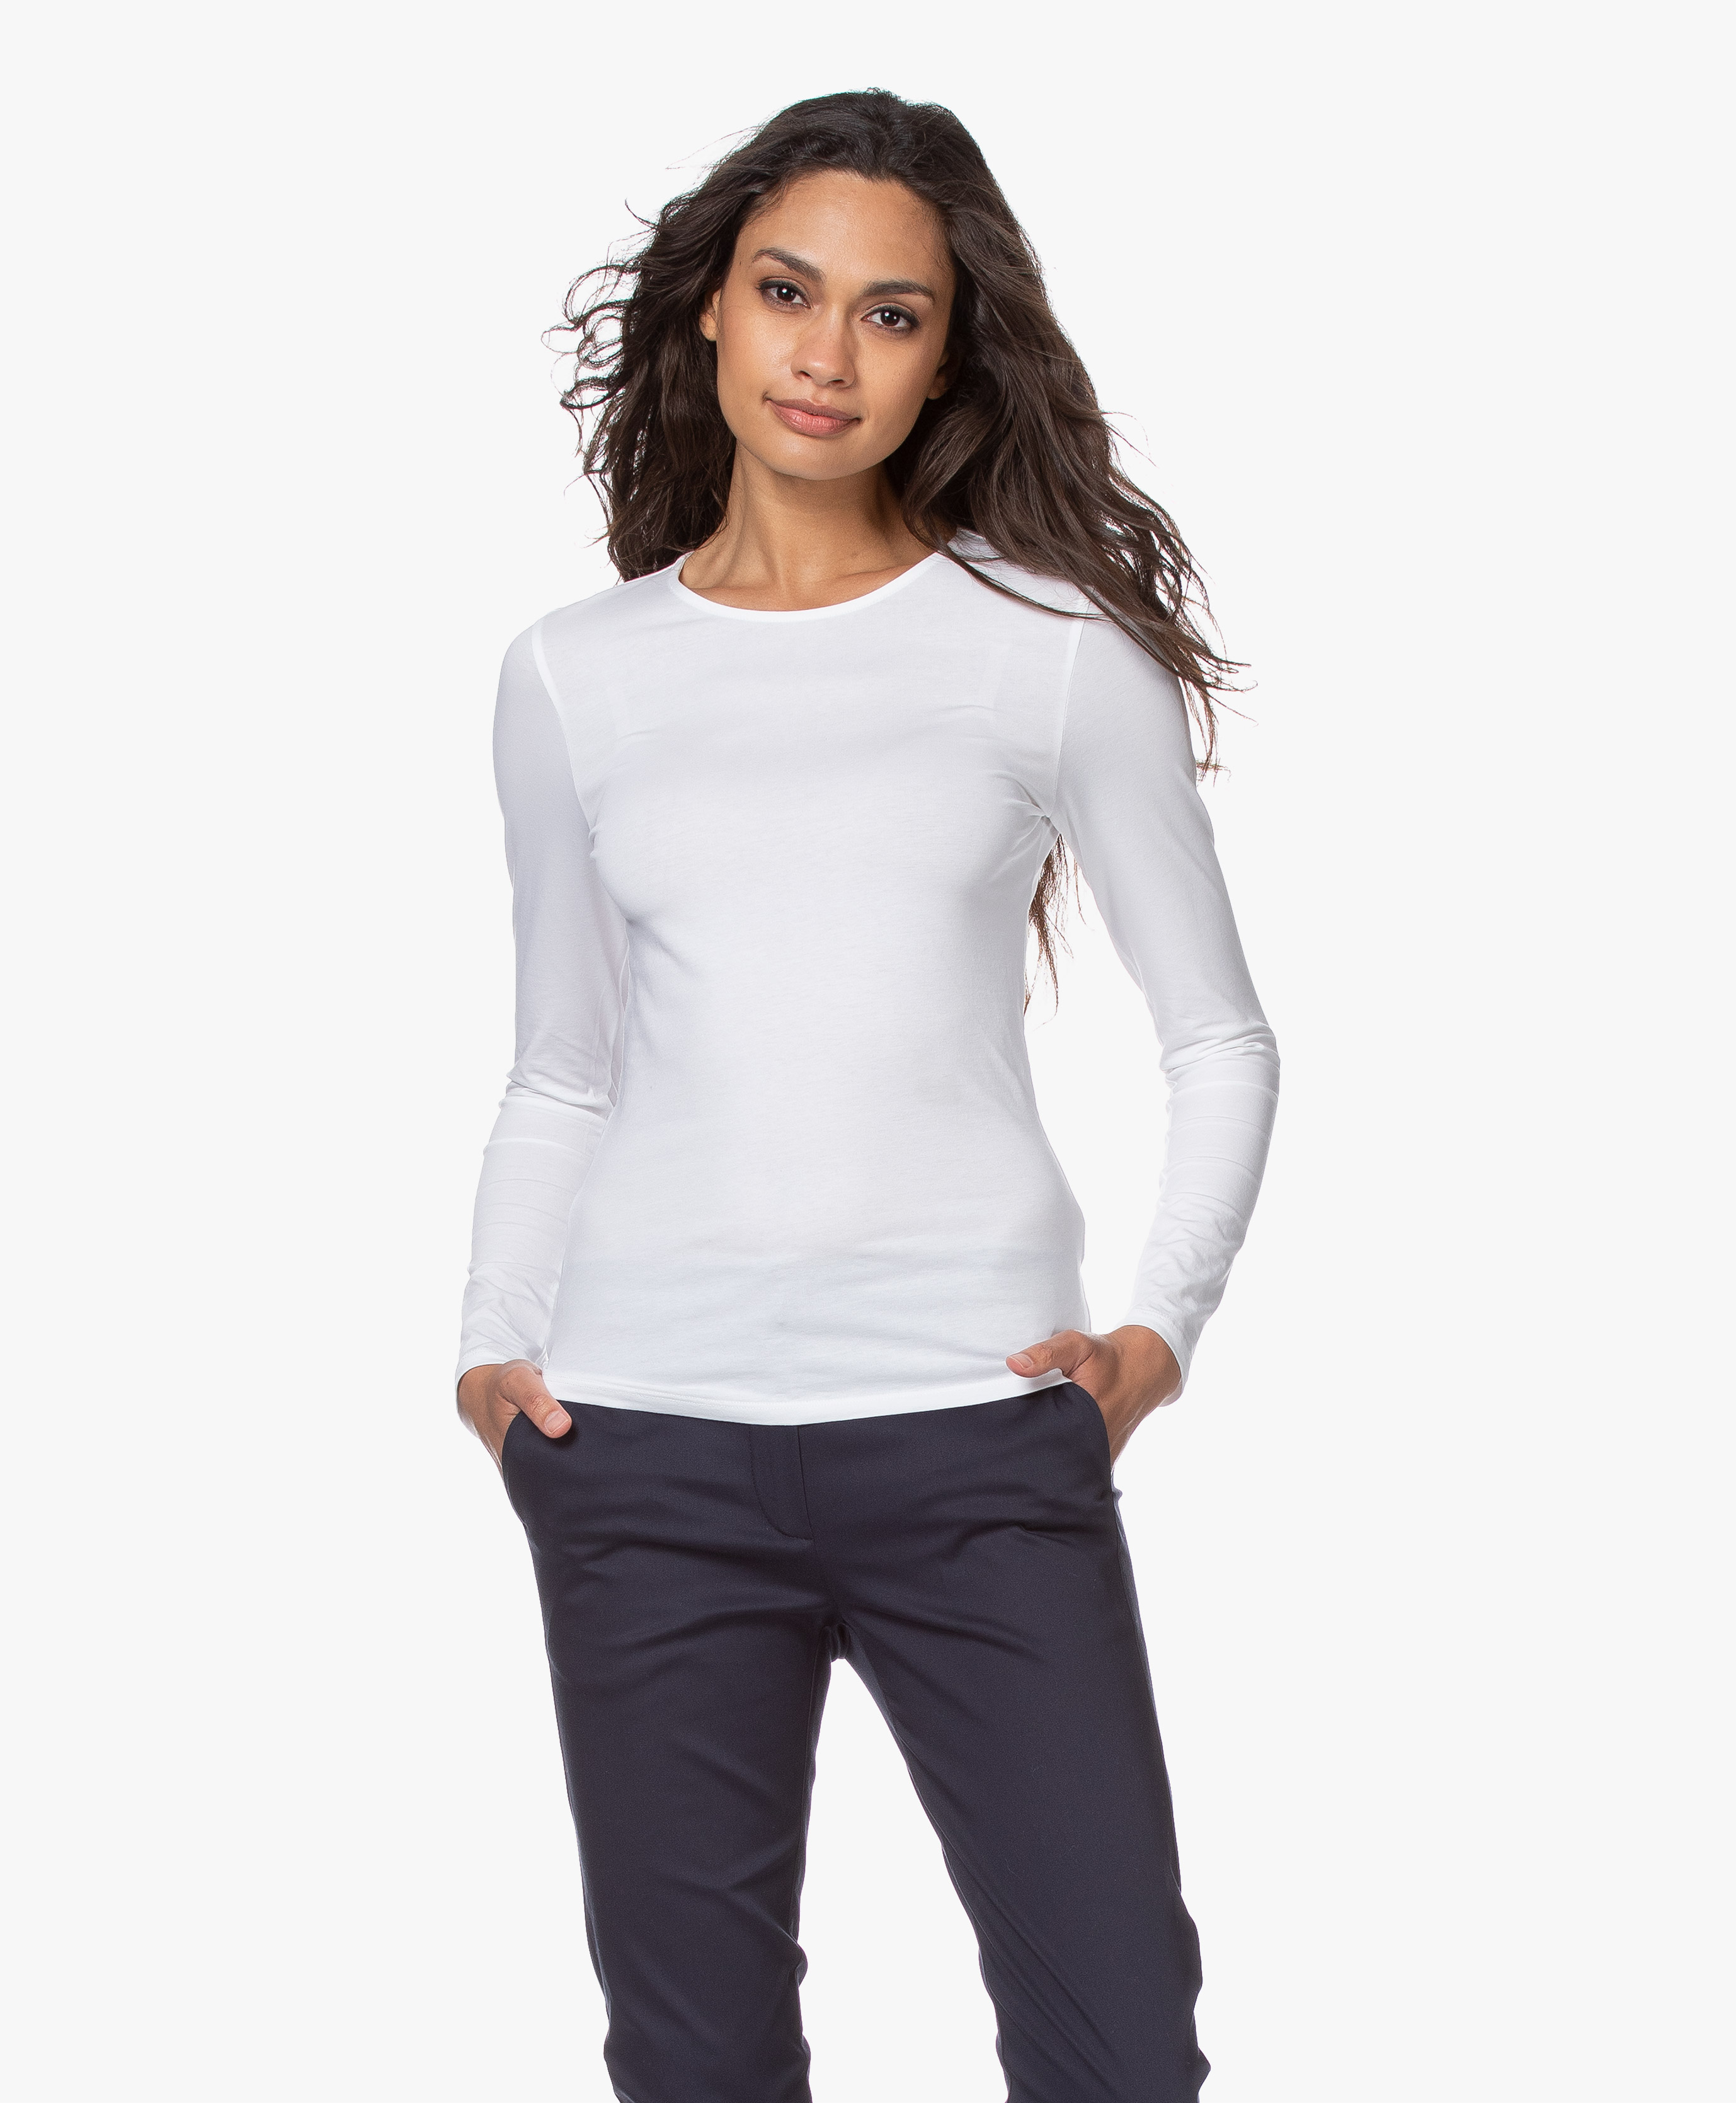 Filippa K Cotton Stretch Long Sleeve White 25332 1009